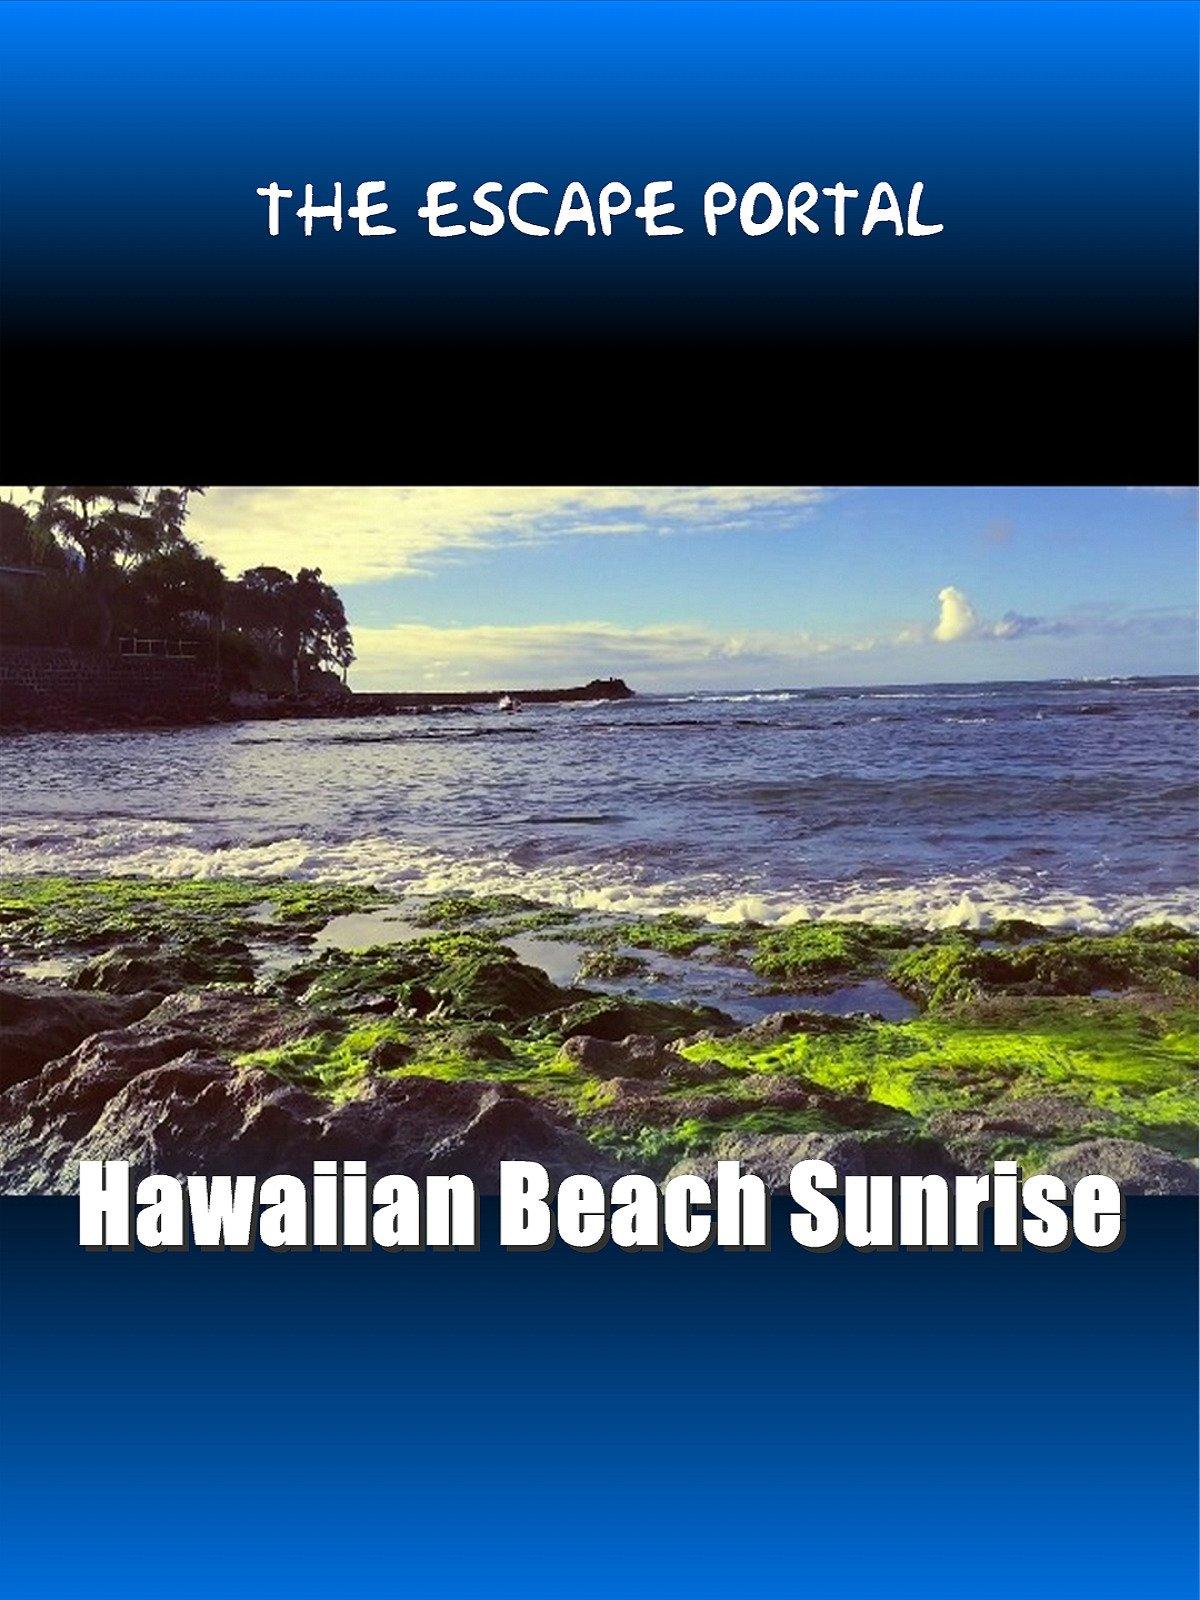 The Escape Portal: Hawaiian Beach Sunrise